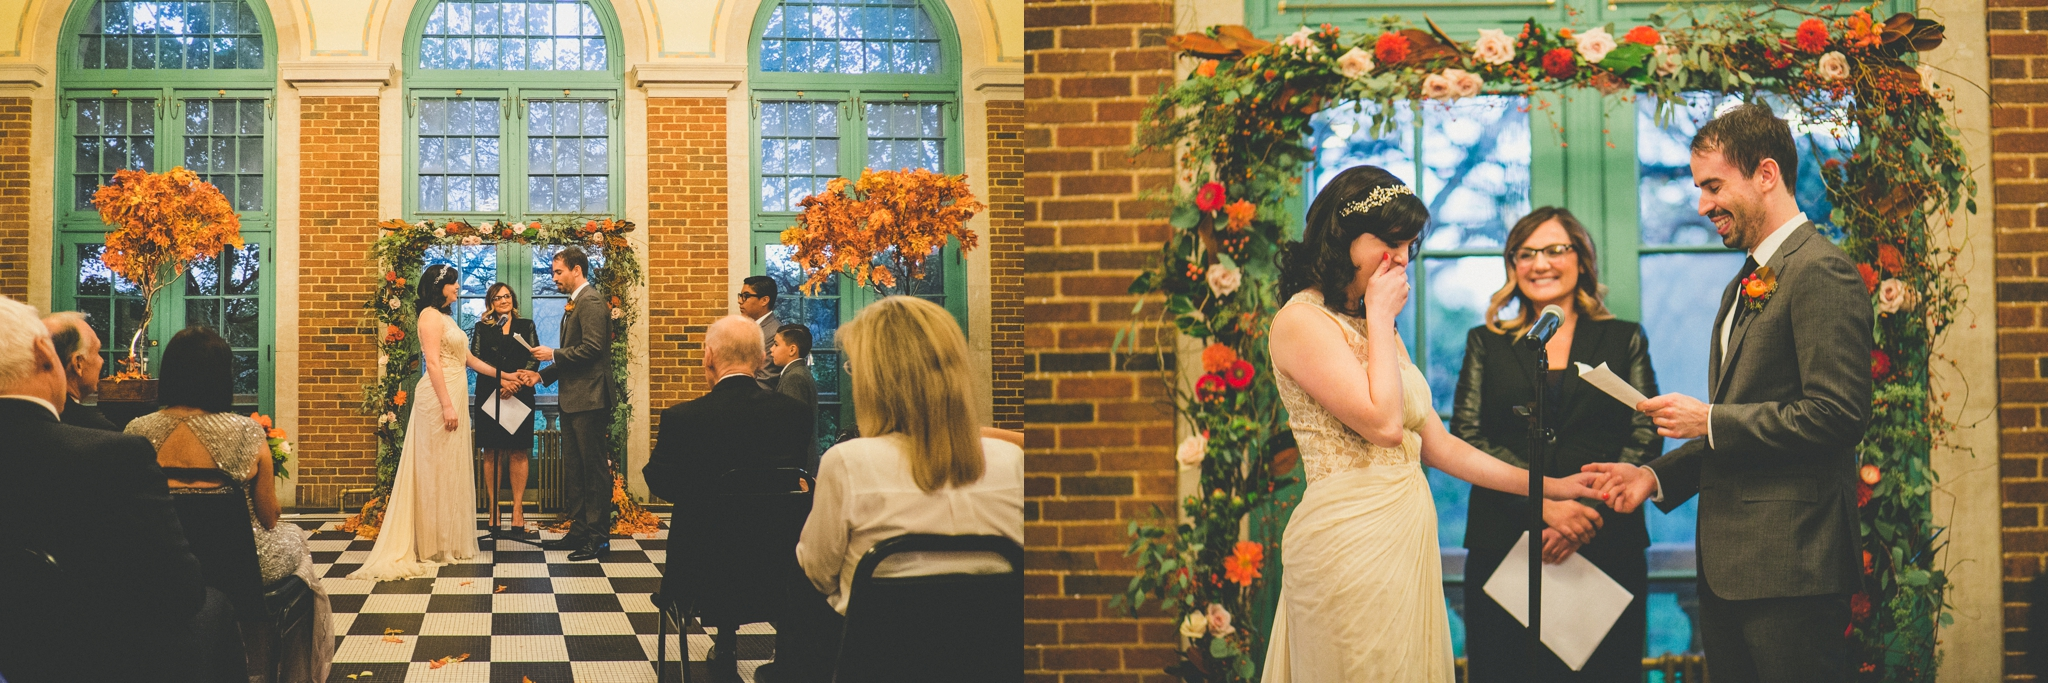 Columbus-Park-Refectory-Wedding-085.jpg